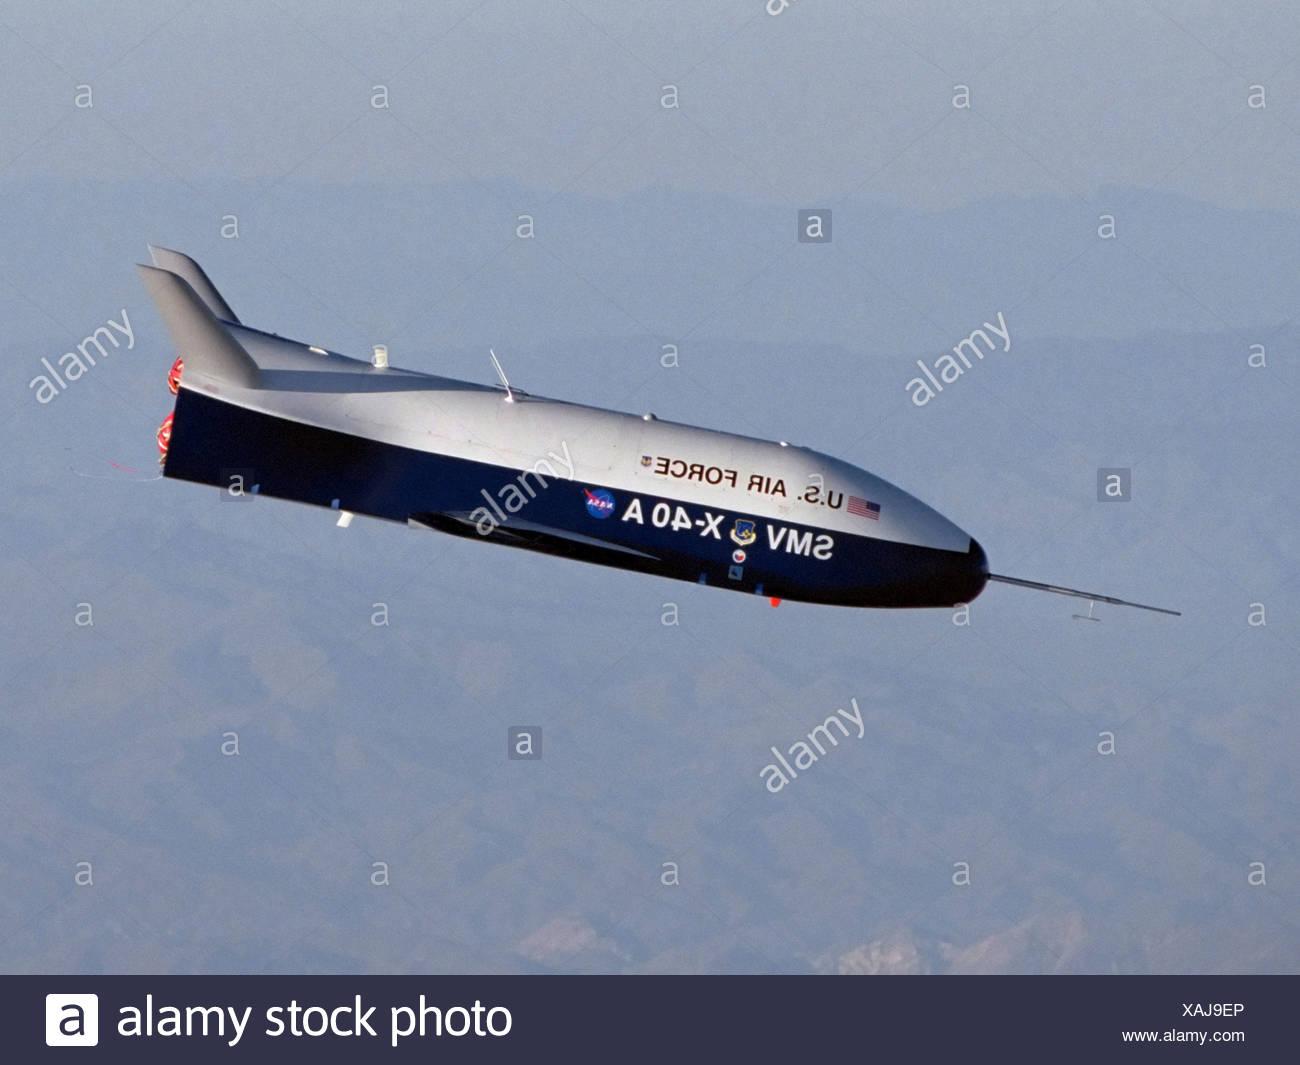 X-40 in Free Flight - Stock Image